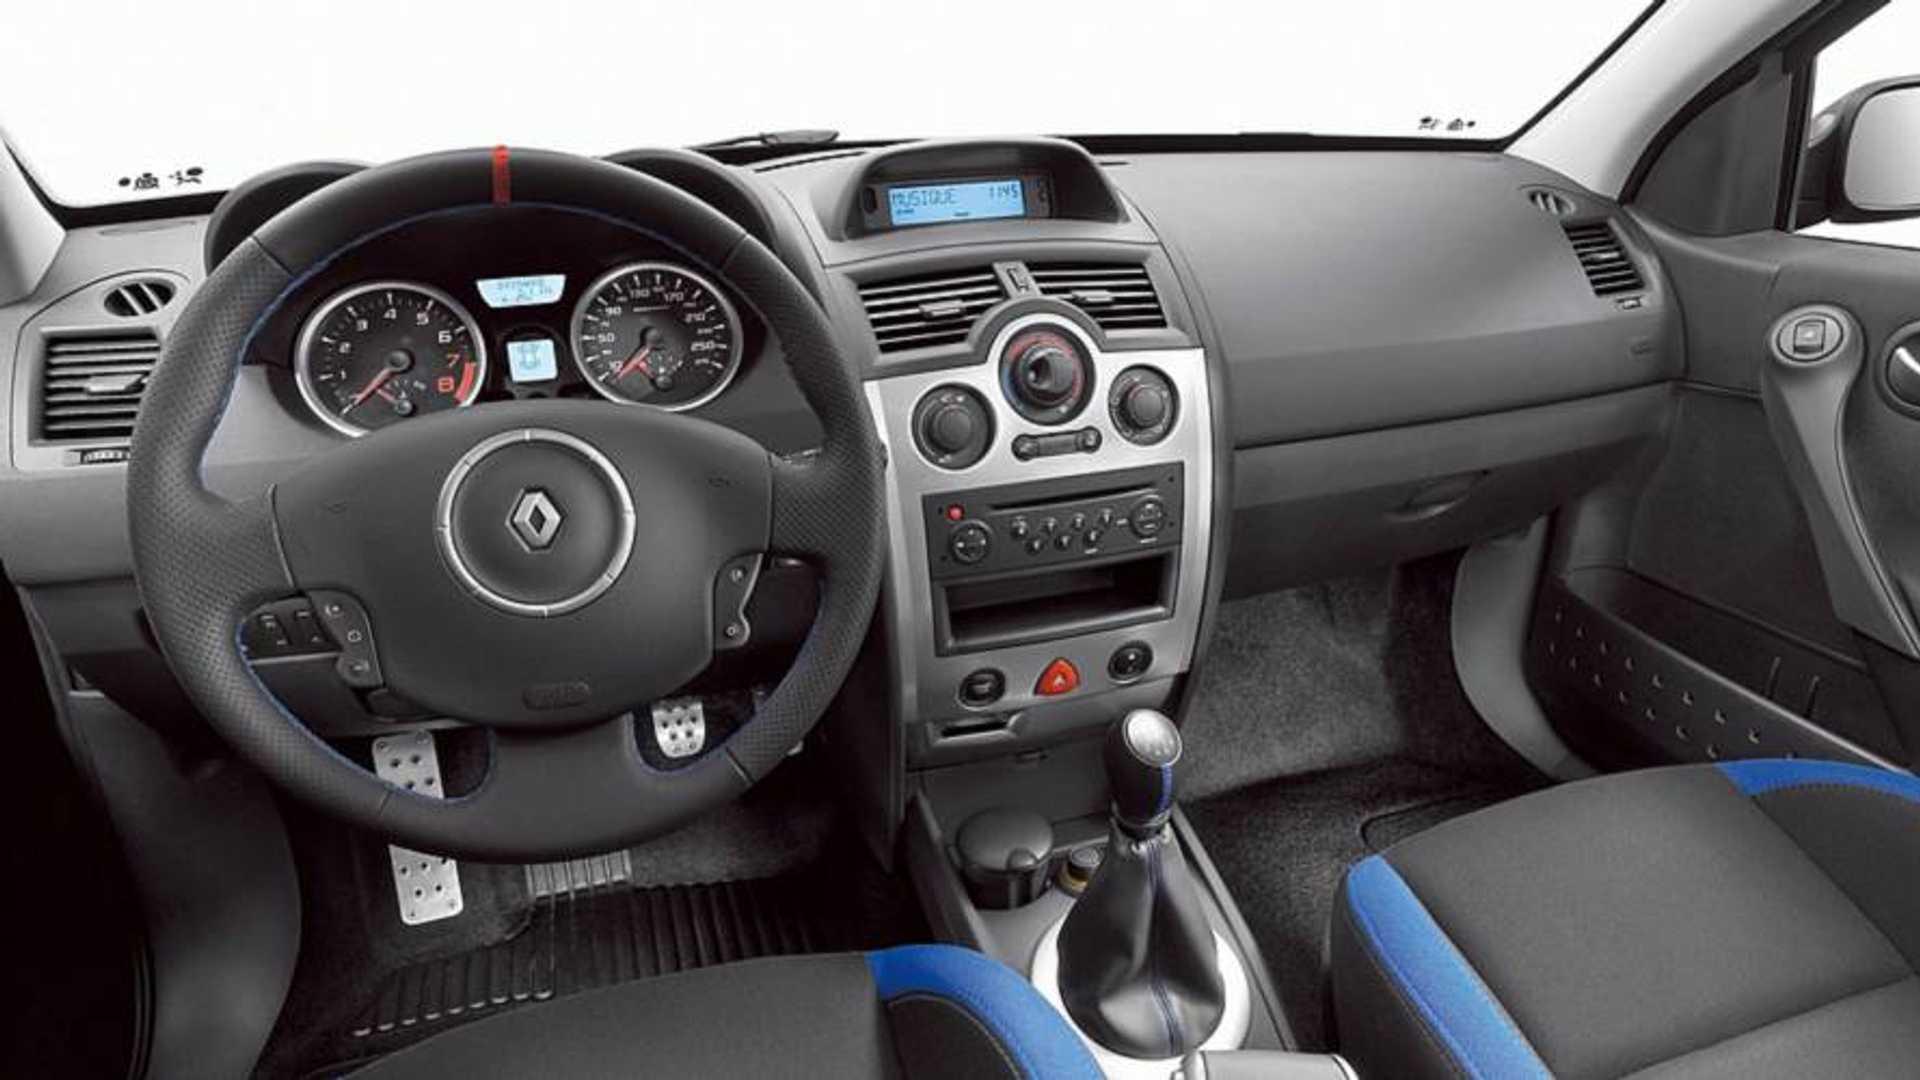 Guide d'achat - Renault Mégane 2 R.S. (2004-2009)